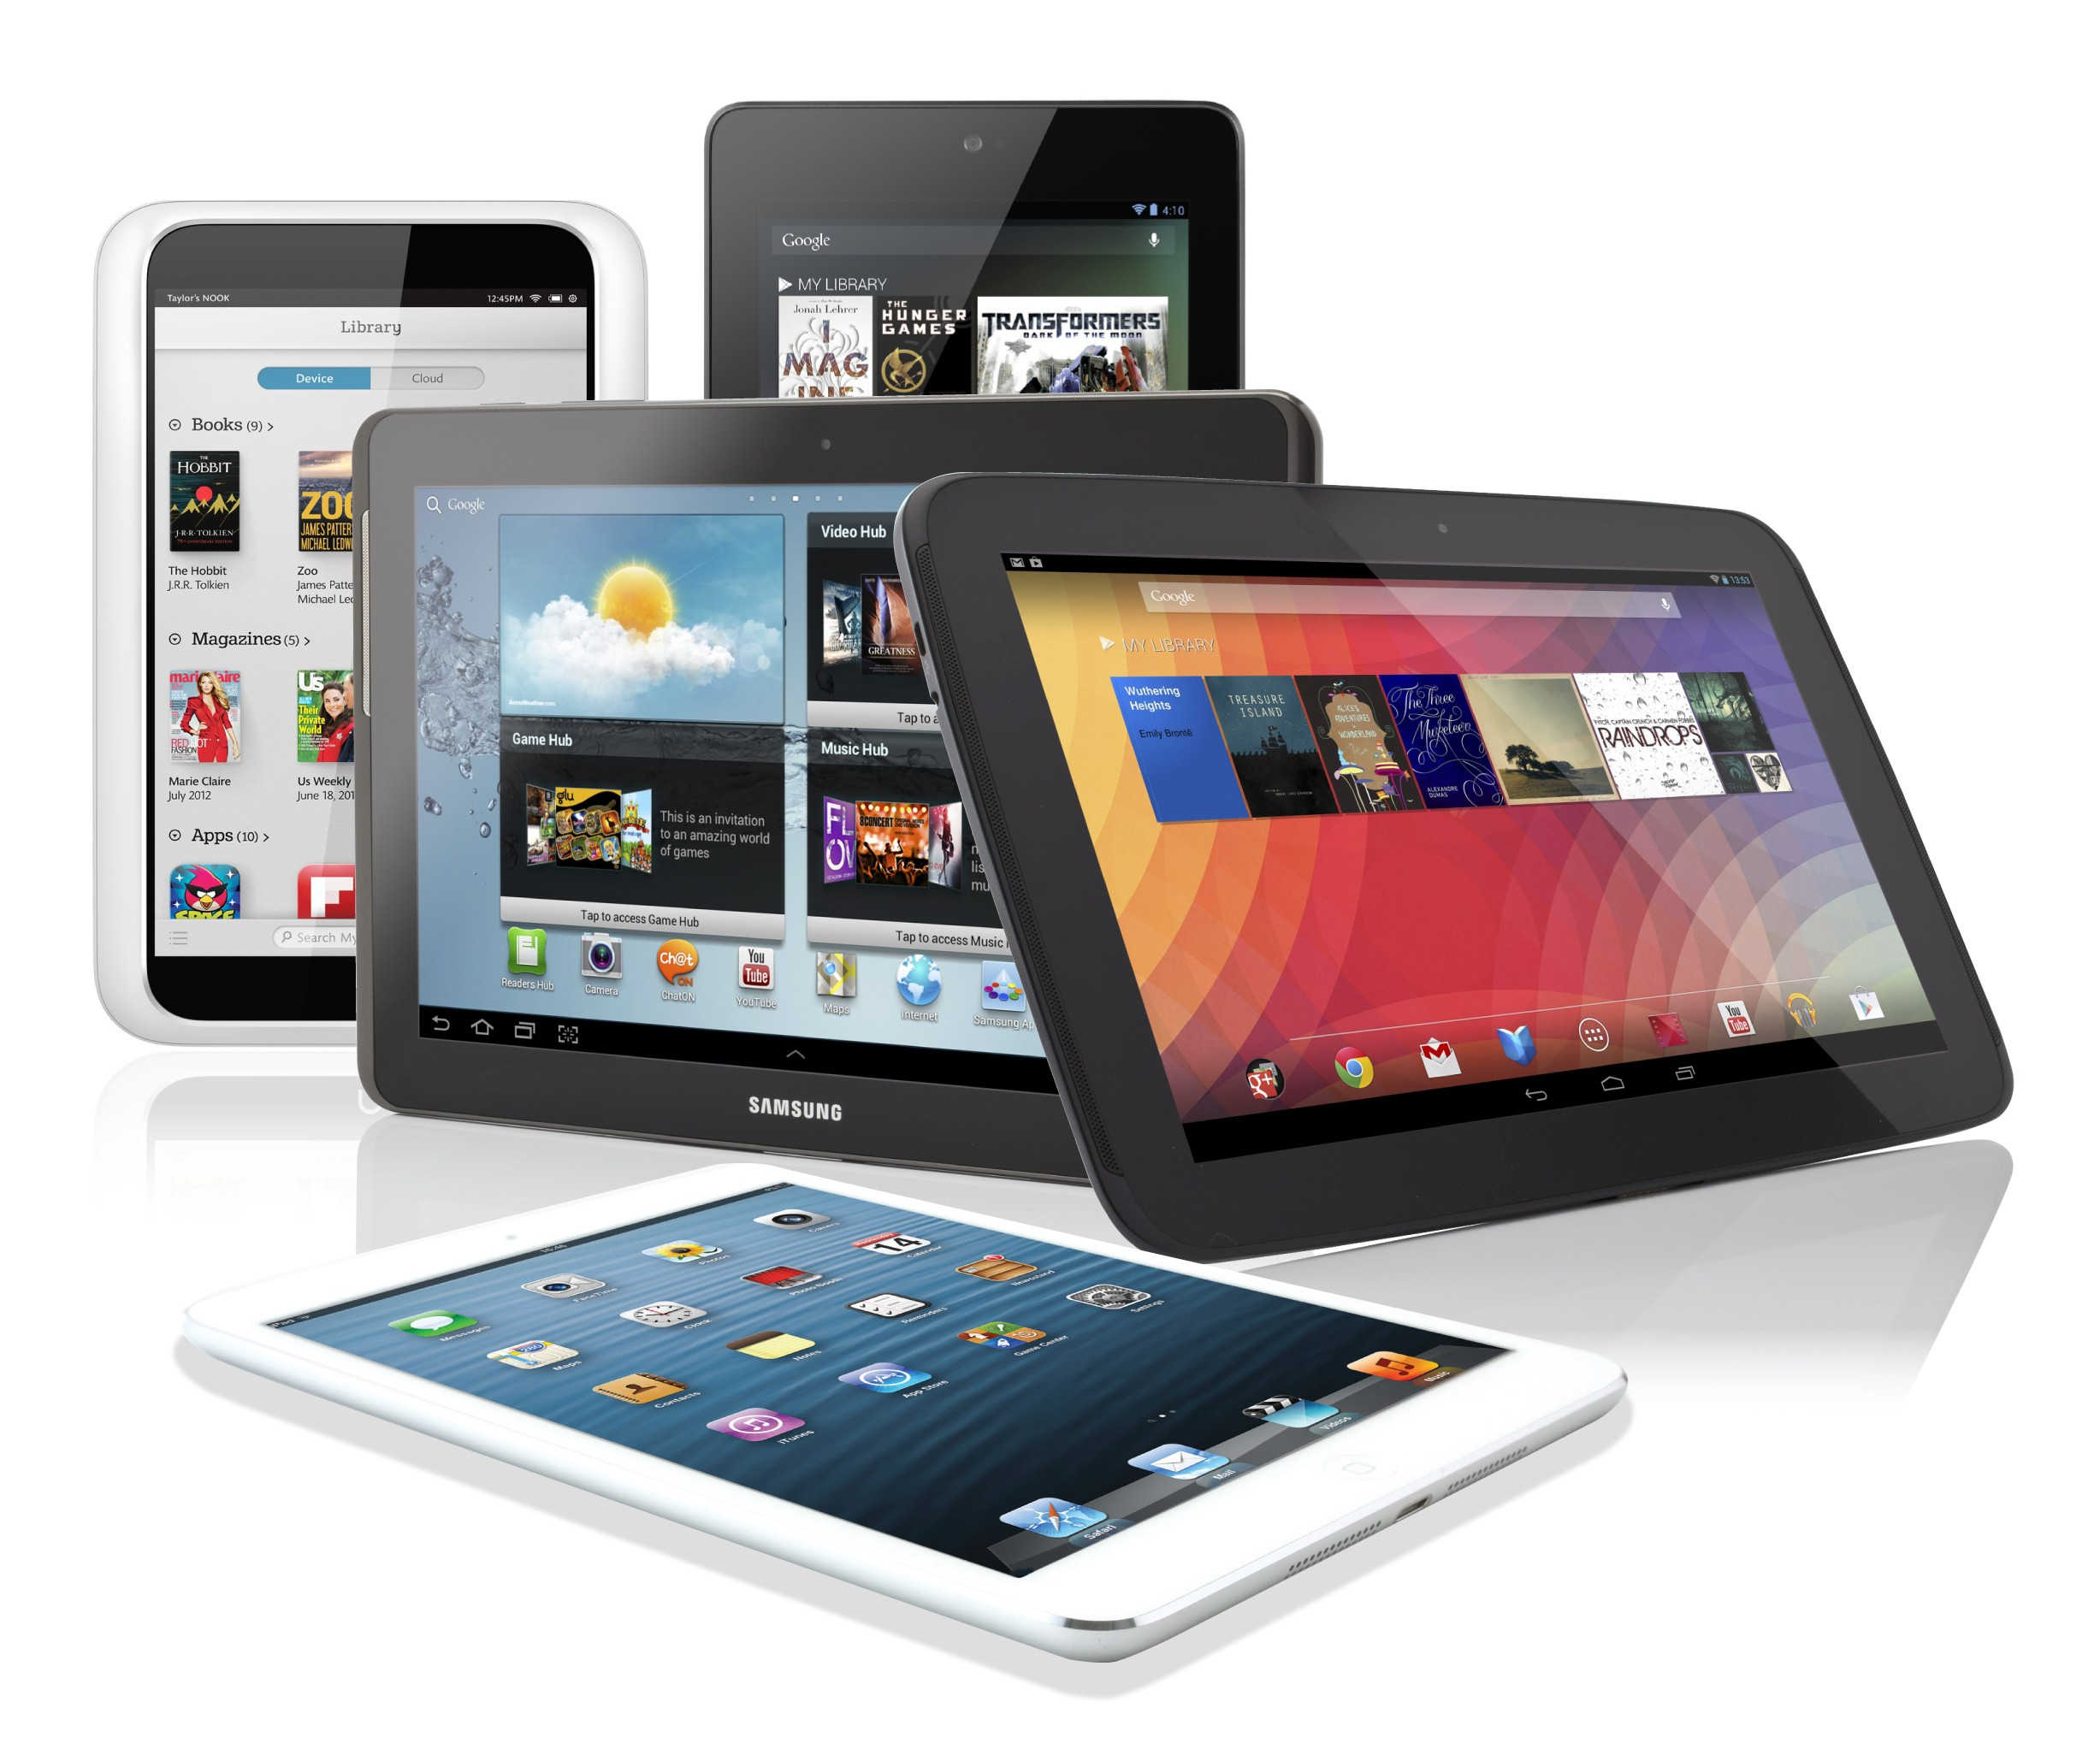 Tablet Sales Predictions